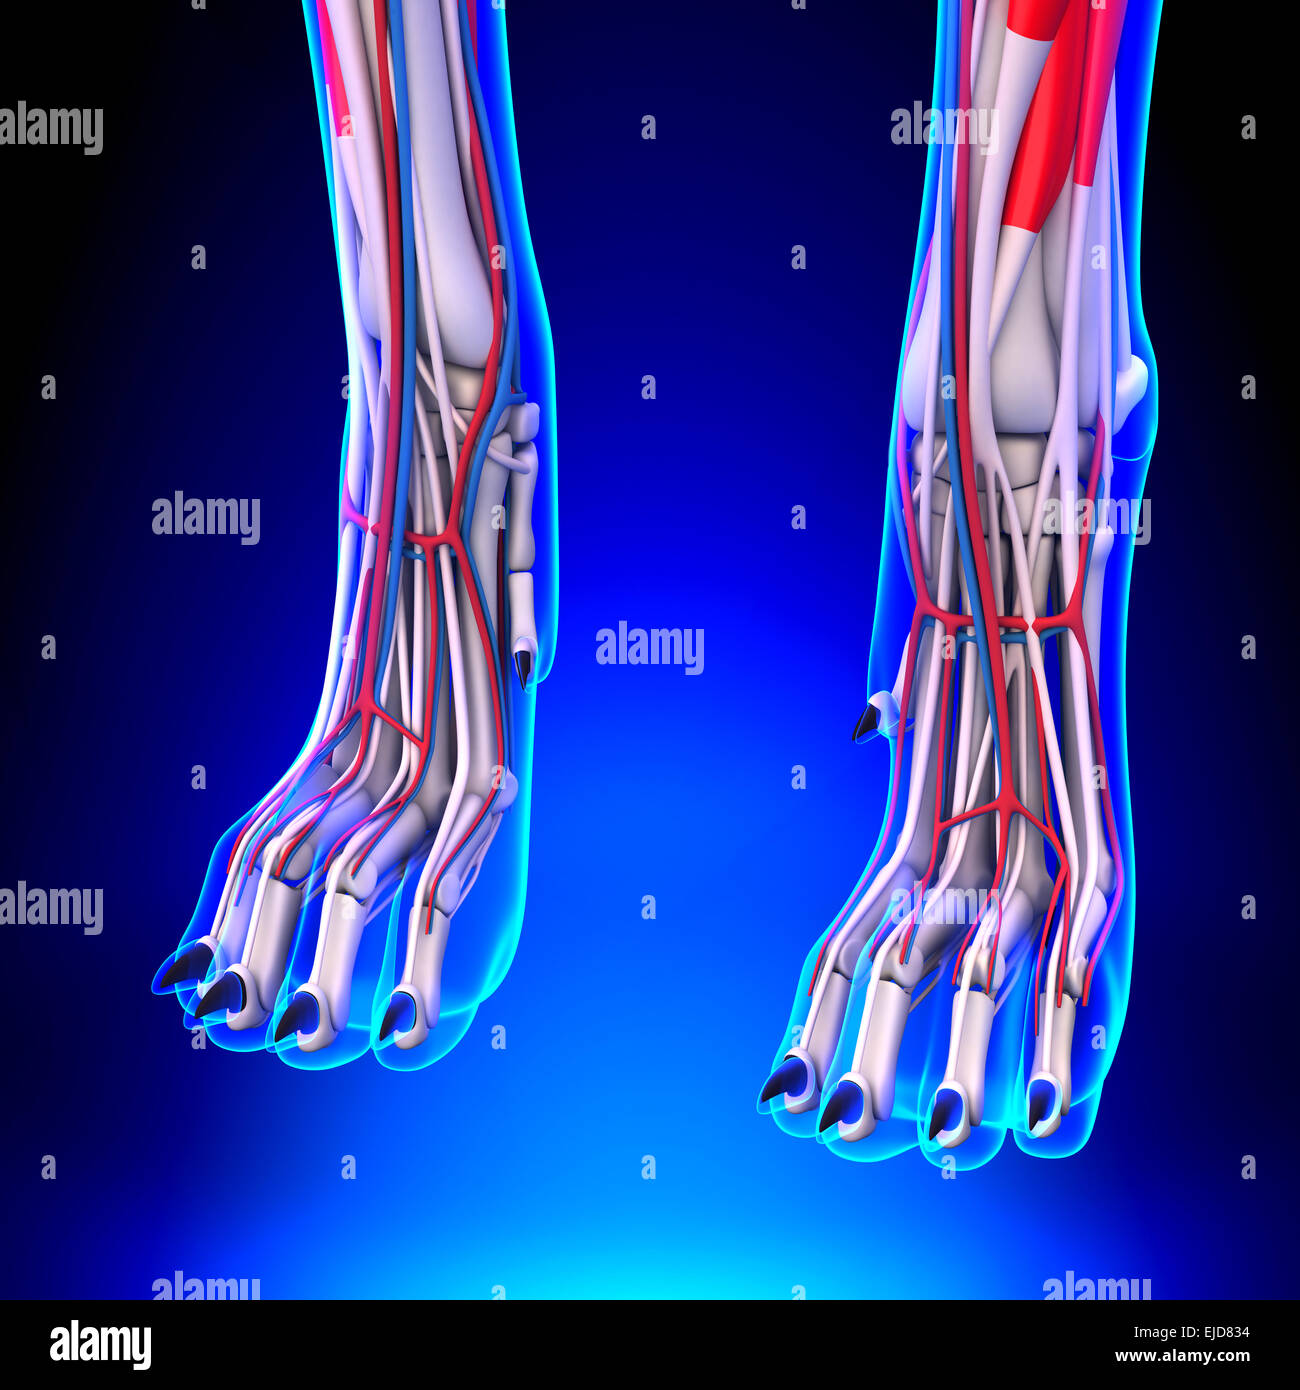 Legs Anatomy Stock Photos & Legs Anatomy Stock Images - Alamy